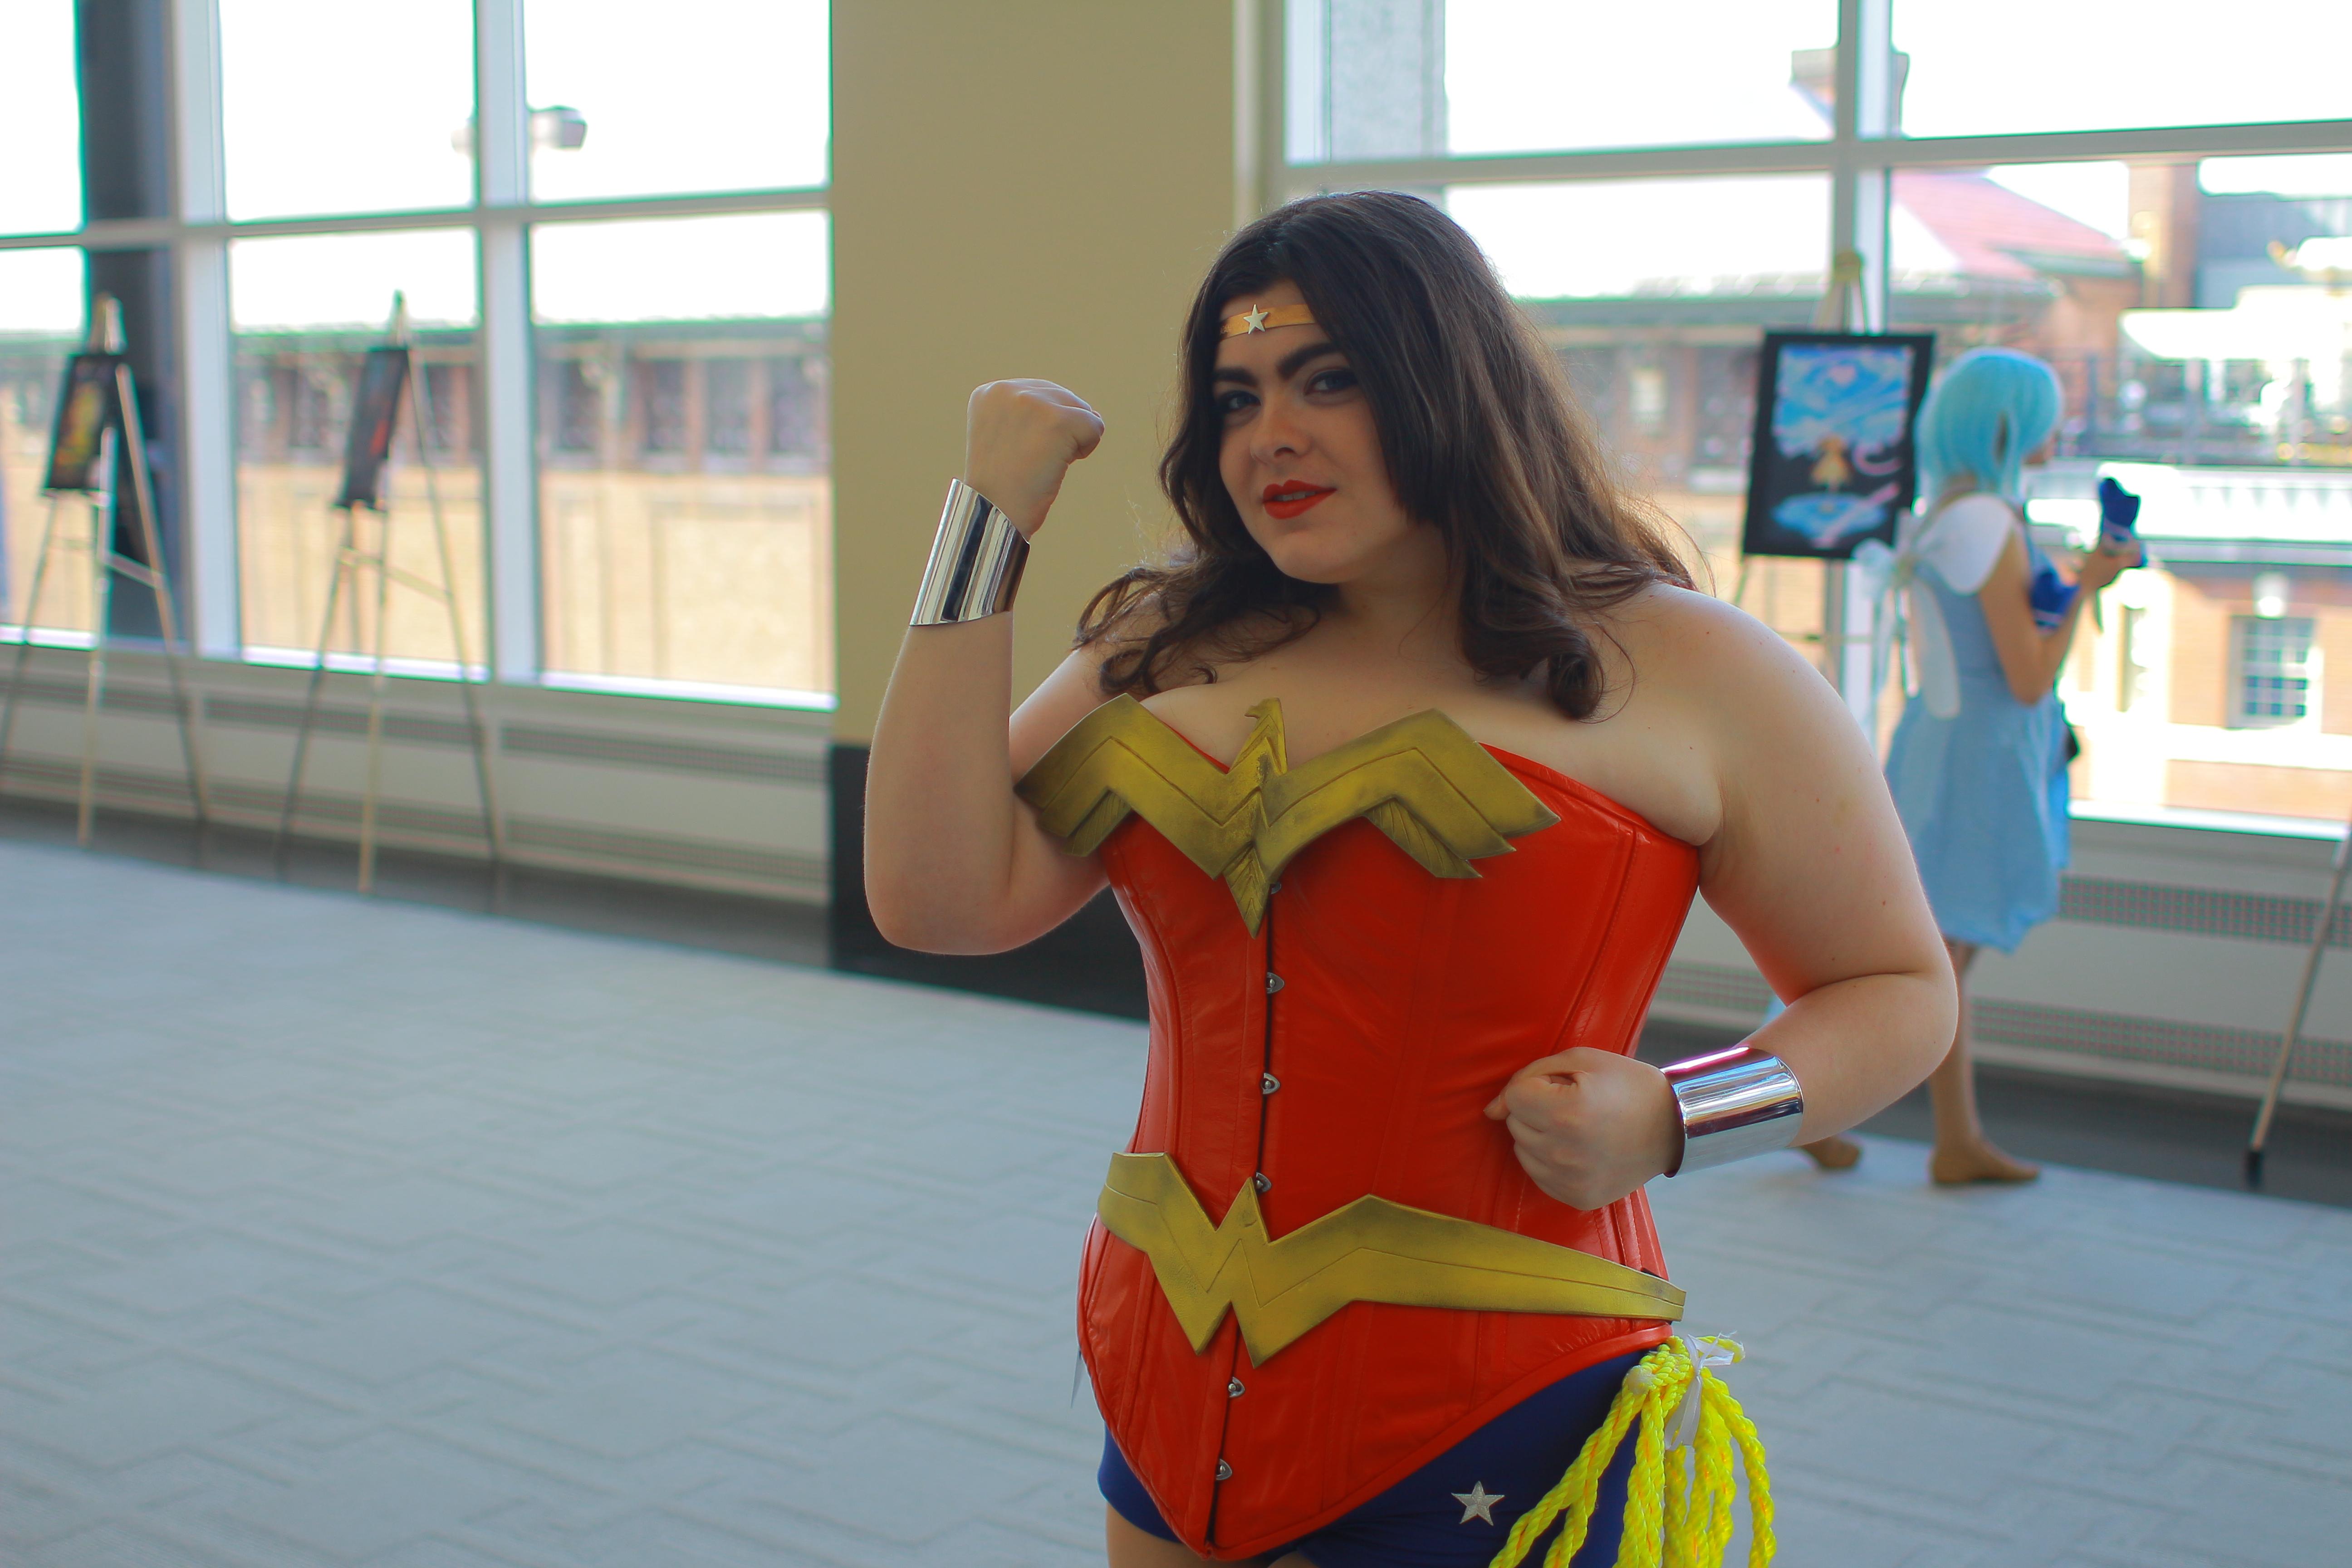 Anime Boston 2014 - Wonder Woman by VideoGameStupid